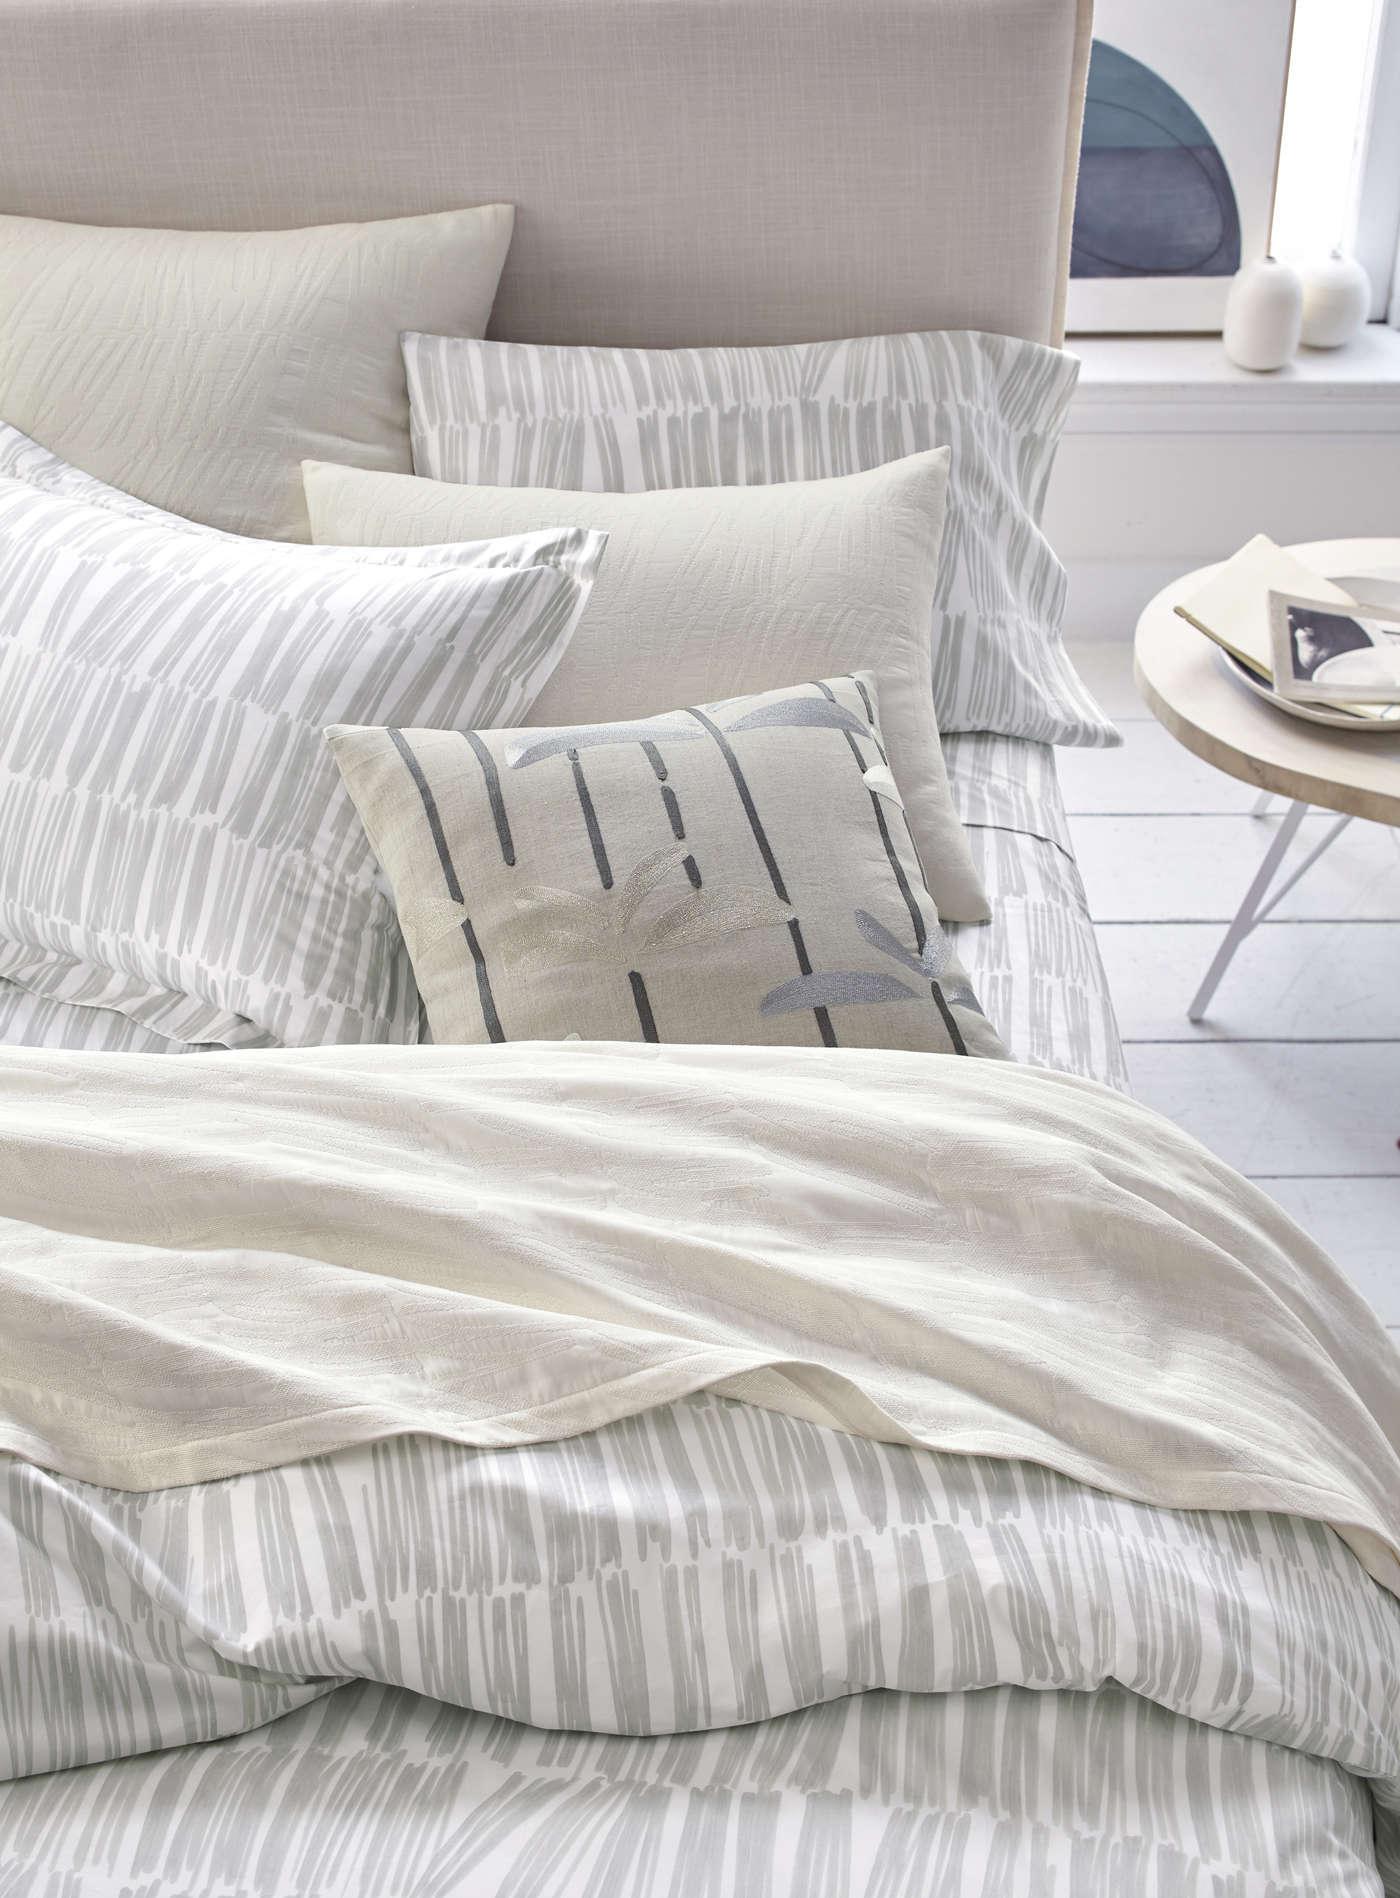 ross product show joey sets covers comforter friends duvet chandler phoebe monica cover rachel tv